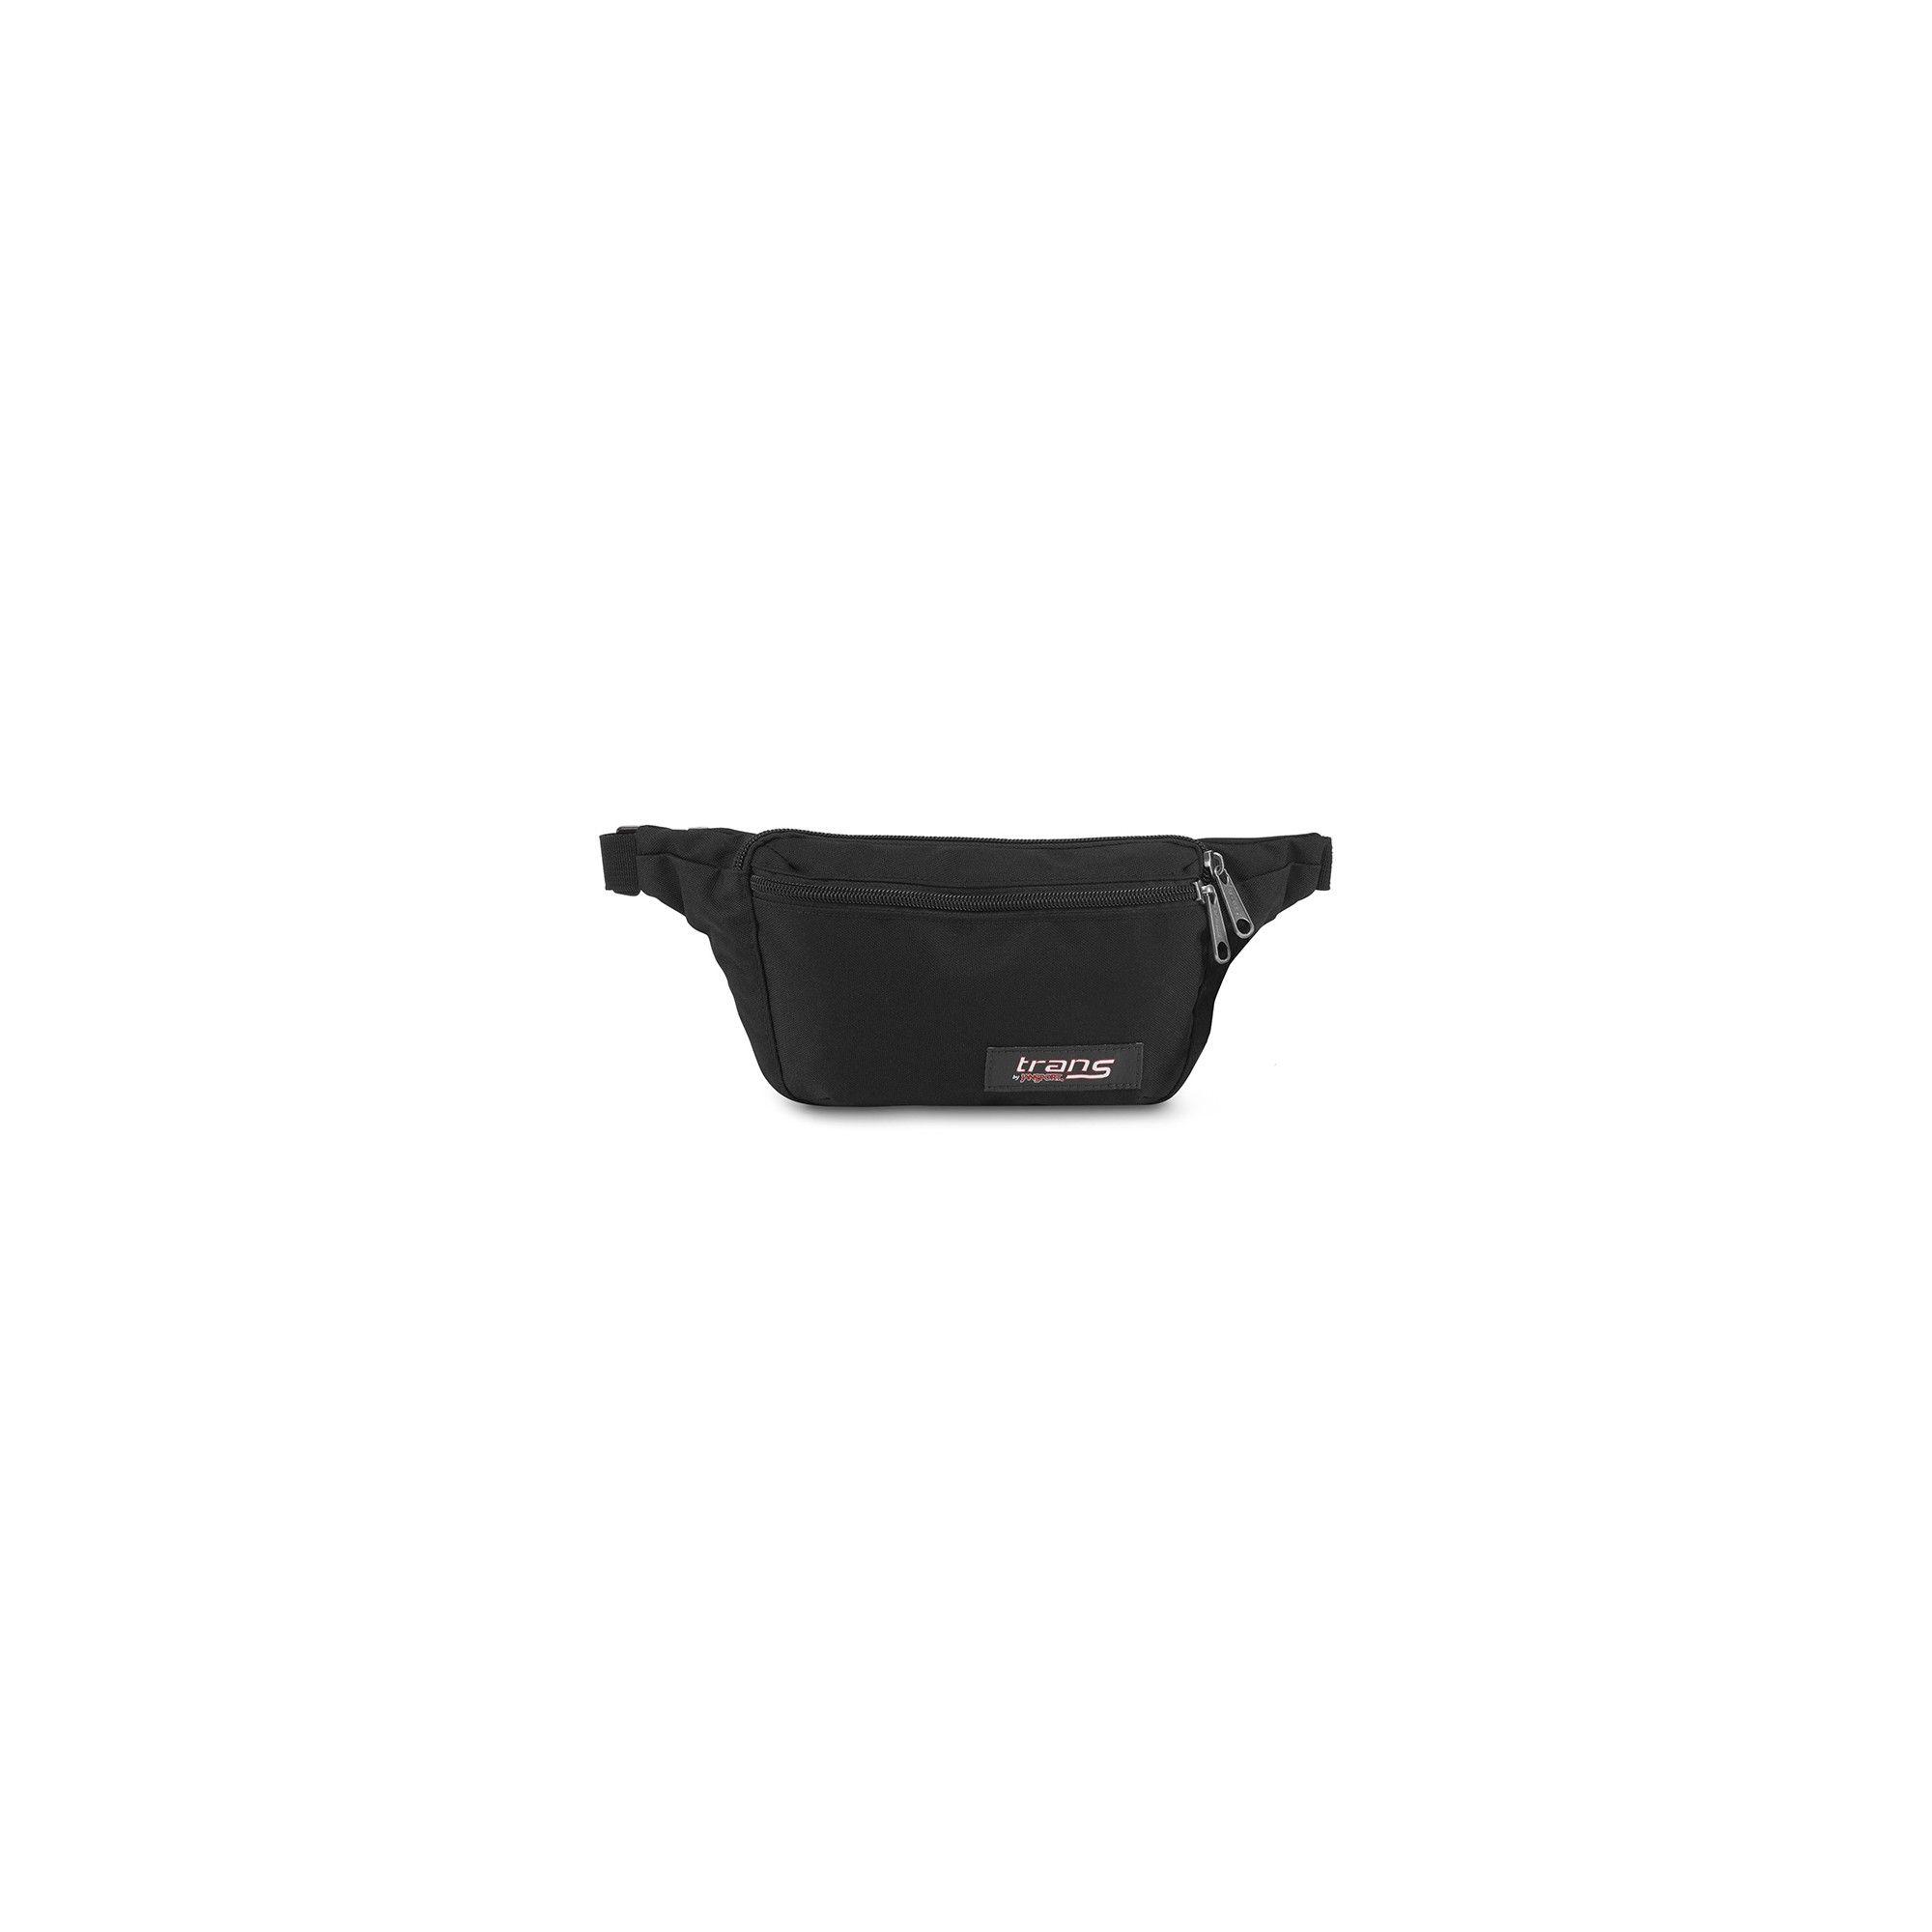 f3fa8f5f15e Trans by JanSport Bazoo Waist Pack - Black